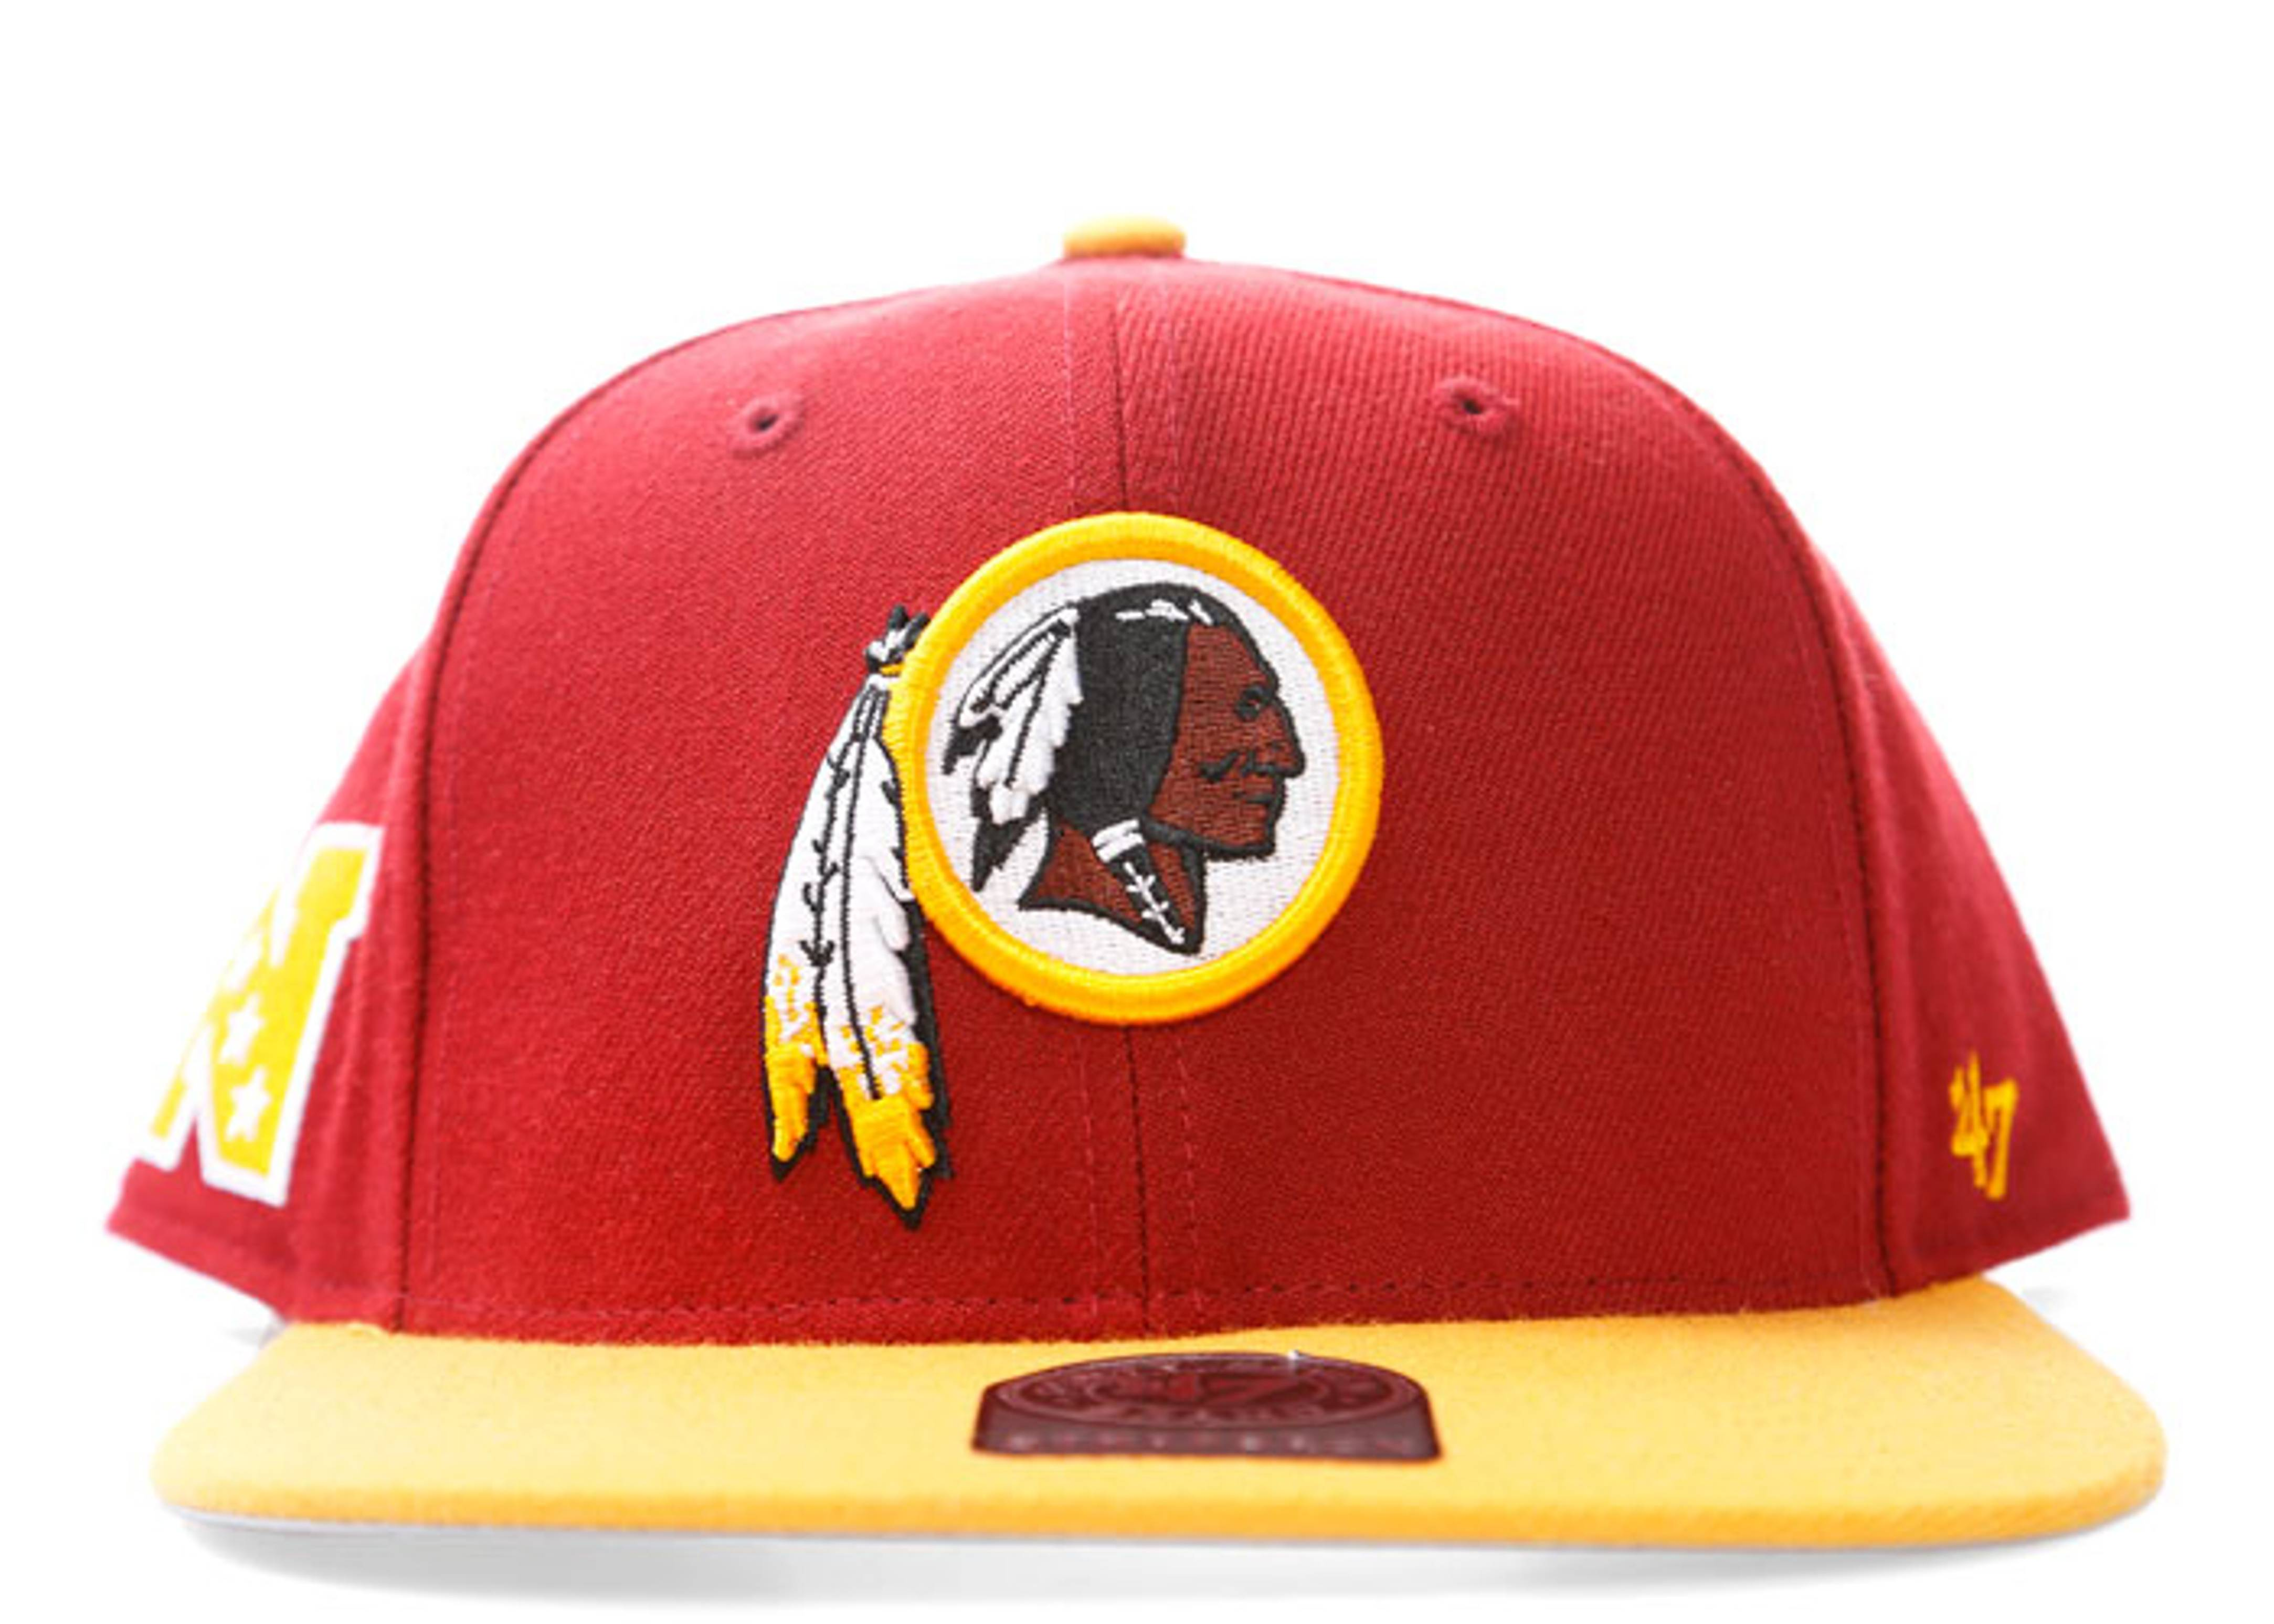 12d7532b30114 Washington Redskins Strap-back - 47 Brand - fsustt32wbsrz - burgundy ...